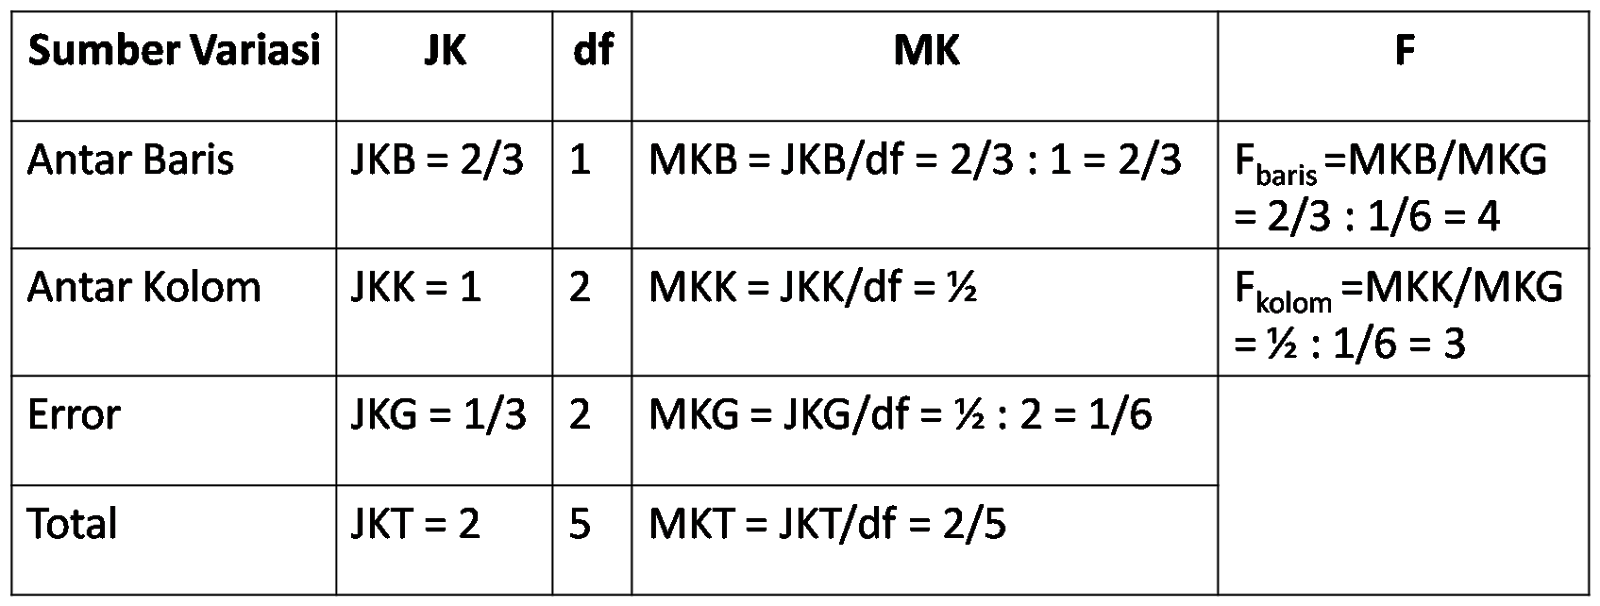 Membuat Hasil Perhitungan kedalam Tabel ANOVA dan Menentukan F